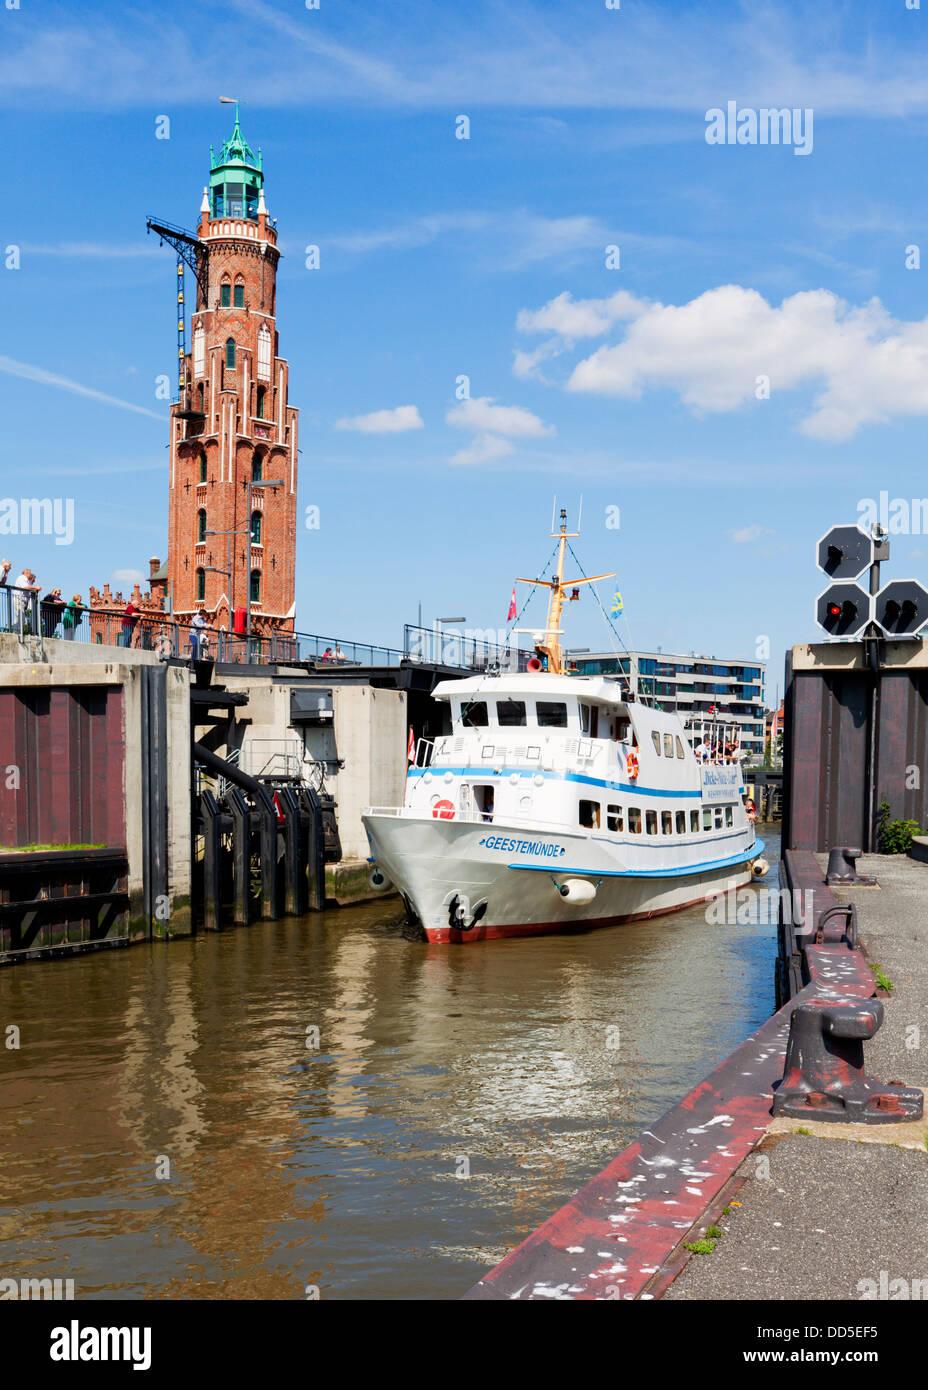 Tourist boat passing Neuer Hafen ship lock at Bremerhaven, Simon-Löschen-Turm lighthouse in background - Stock Image